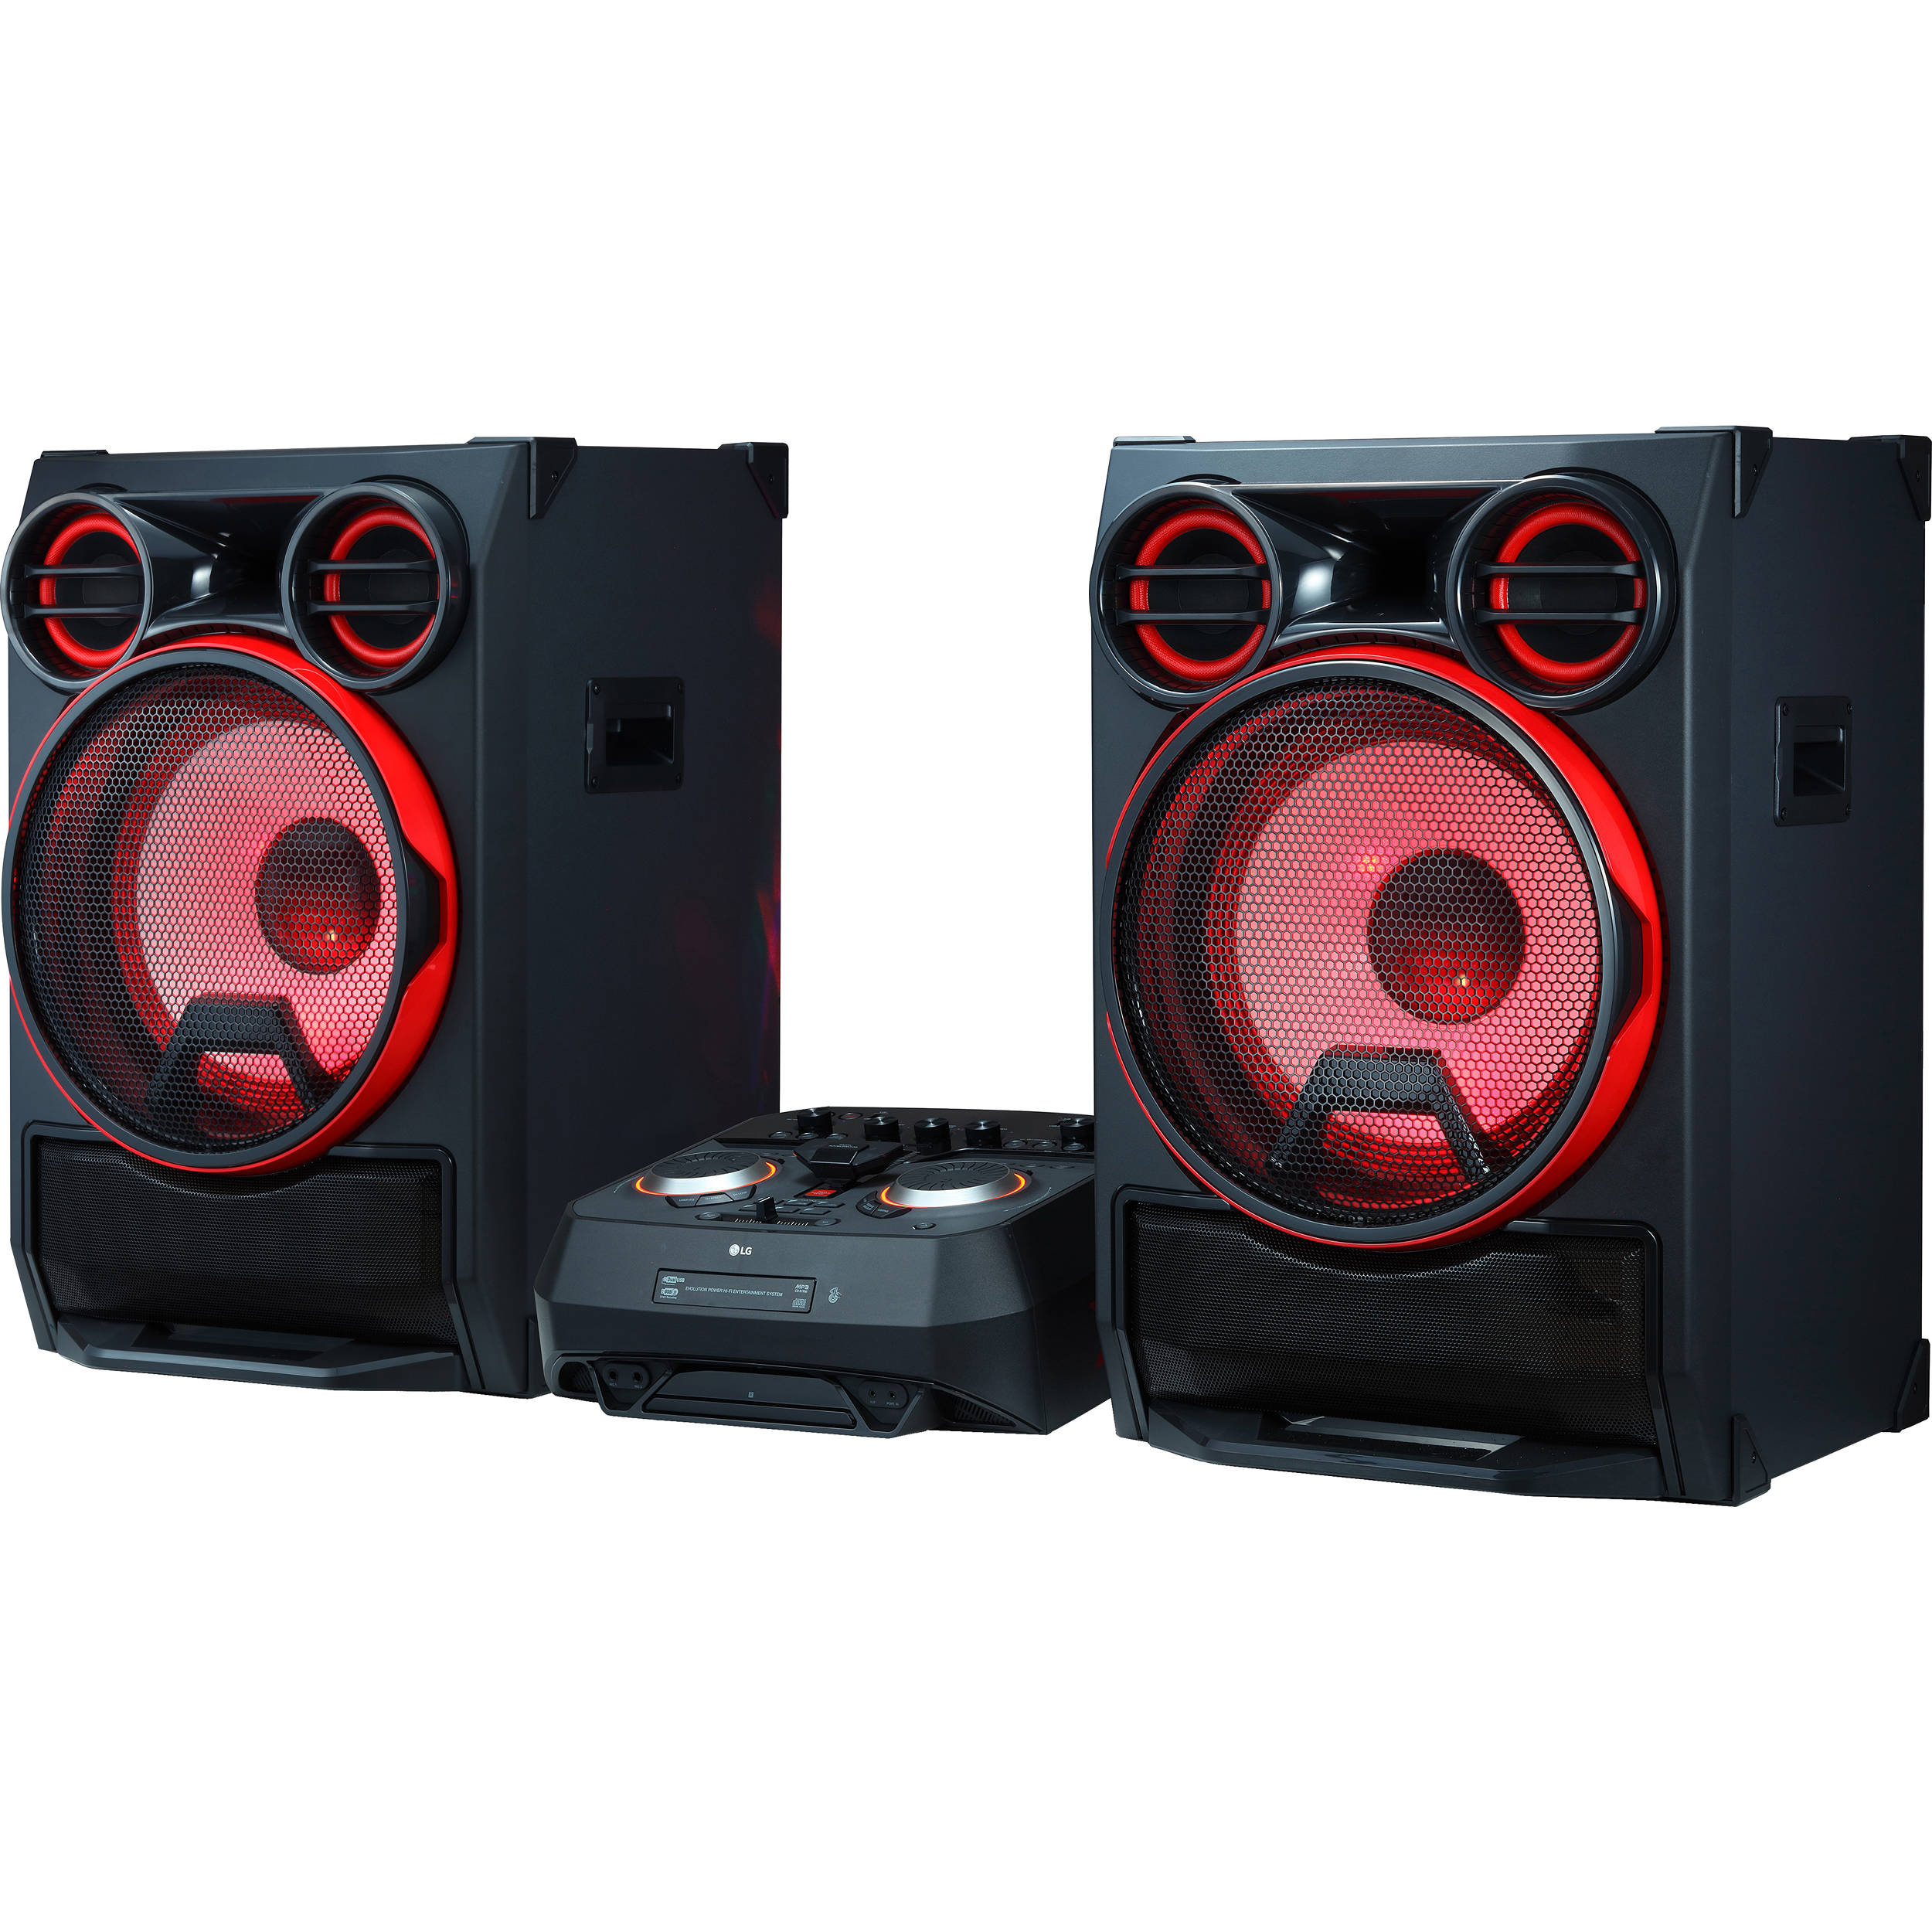 LG CK99 5000W Bluetooth Music System CK99 B&H Photo Video